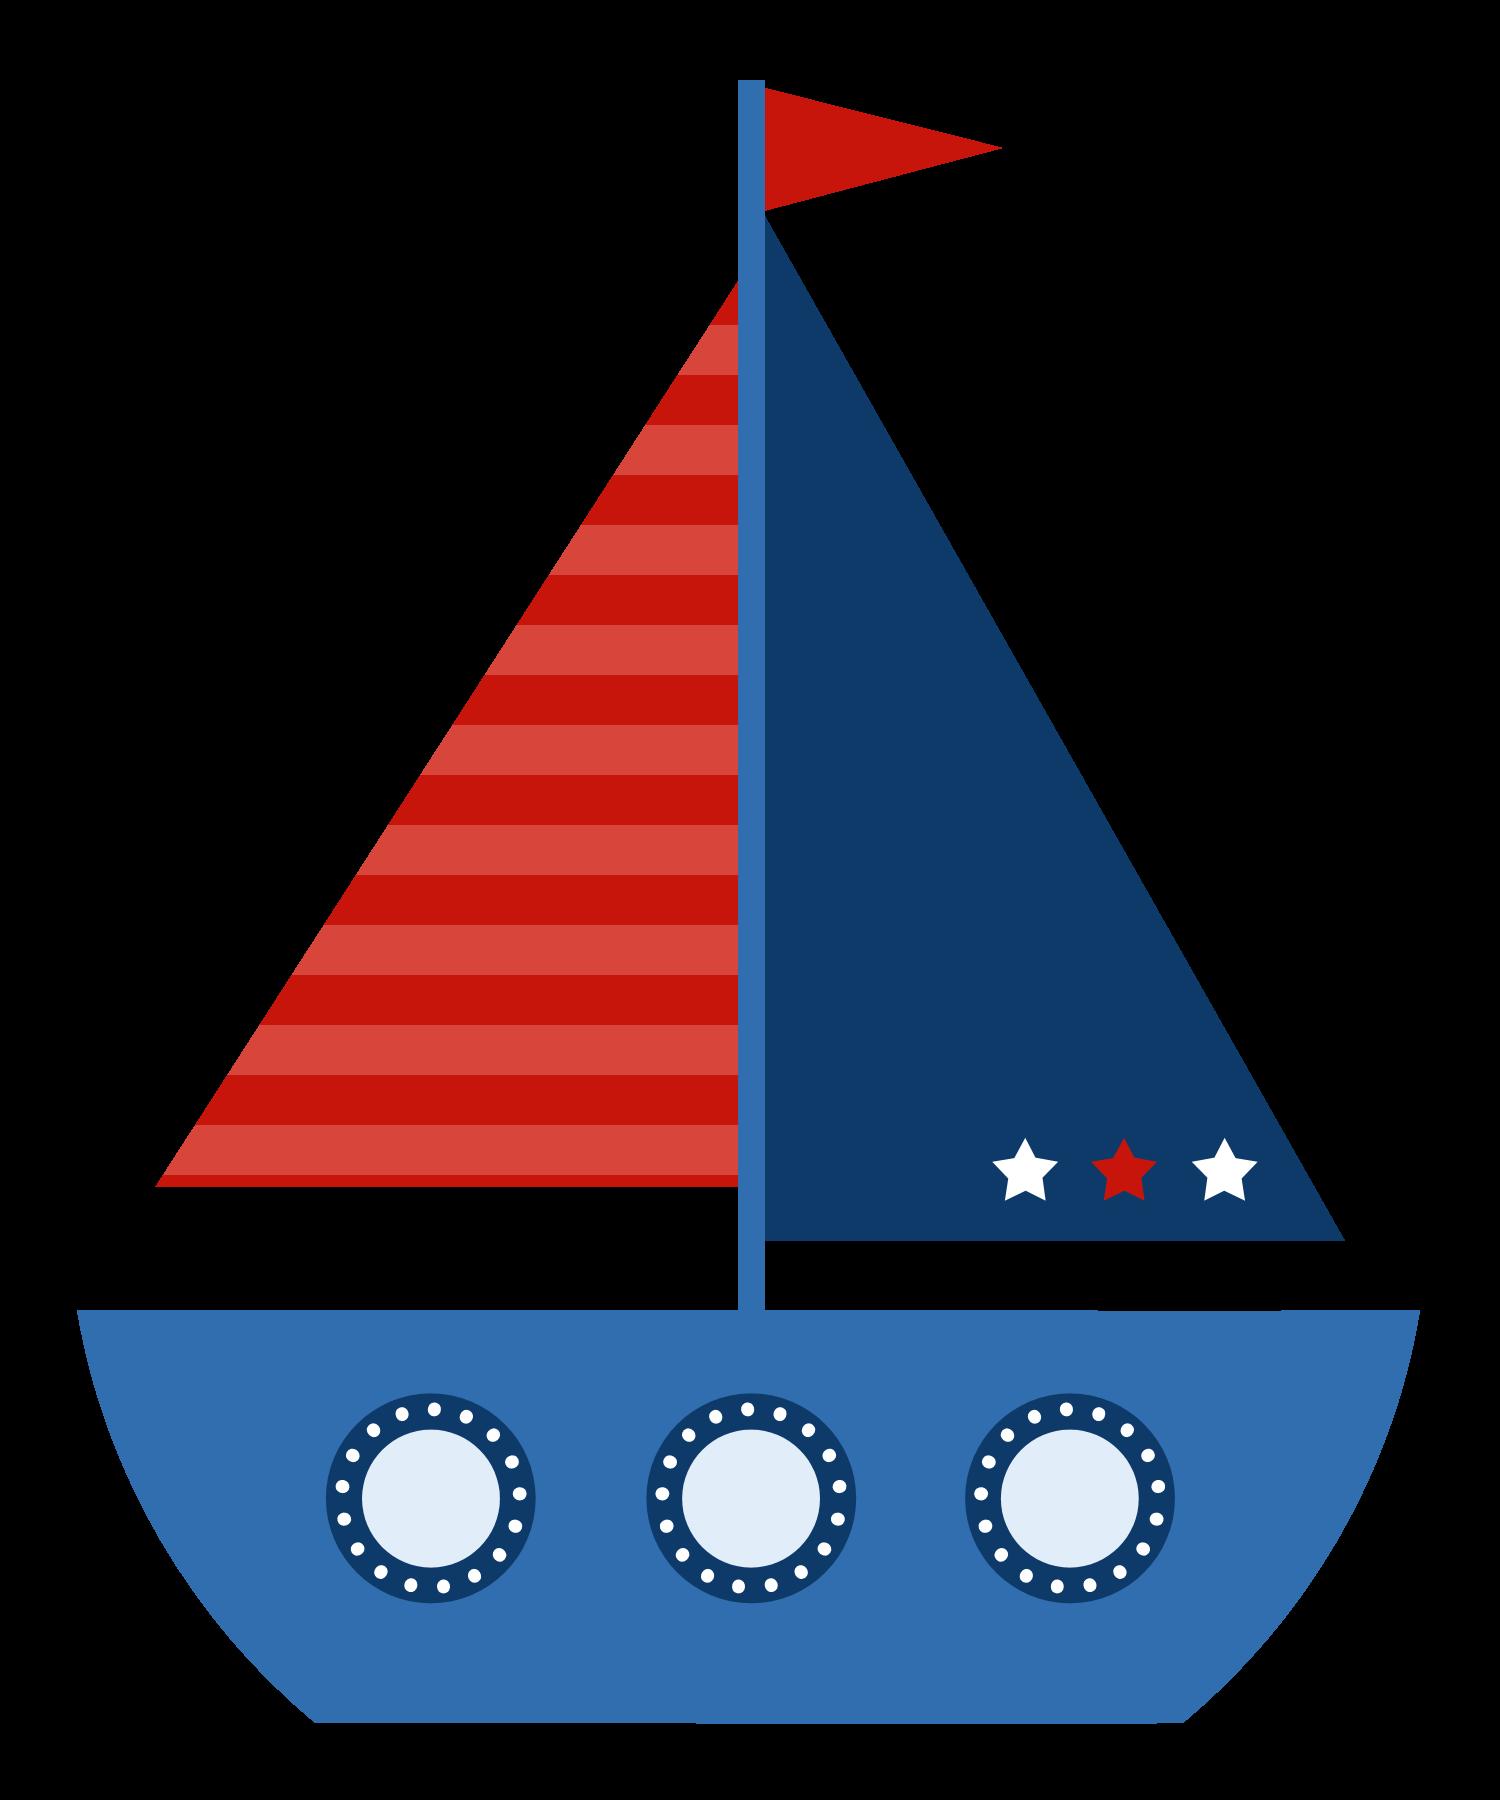 Sailing Boat clipart themed Sail and boats boat Pesquisa